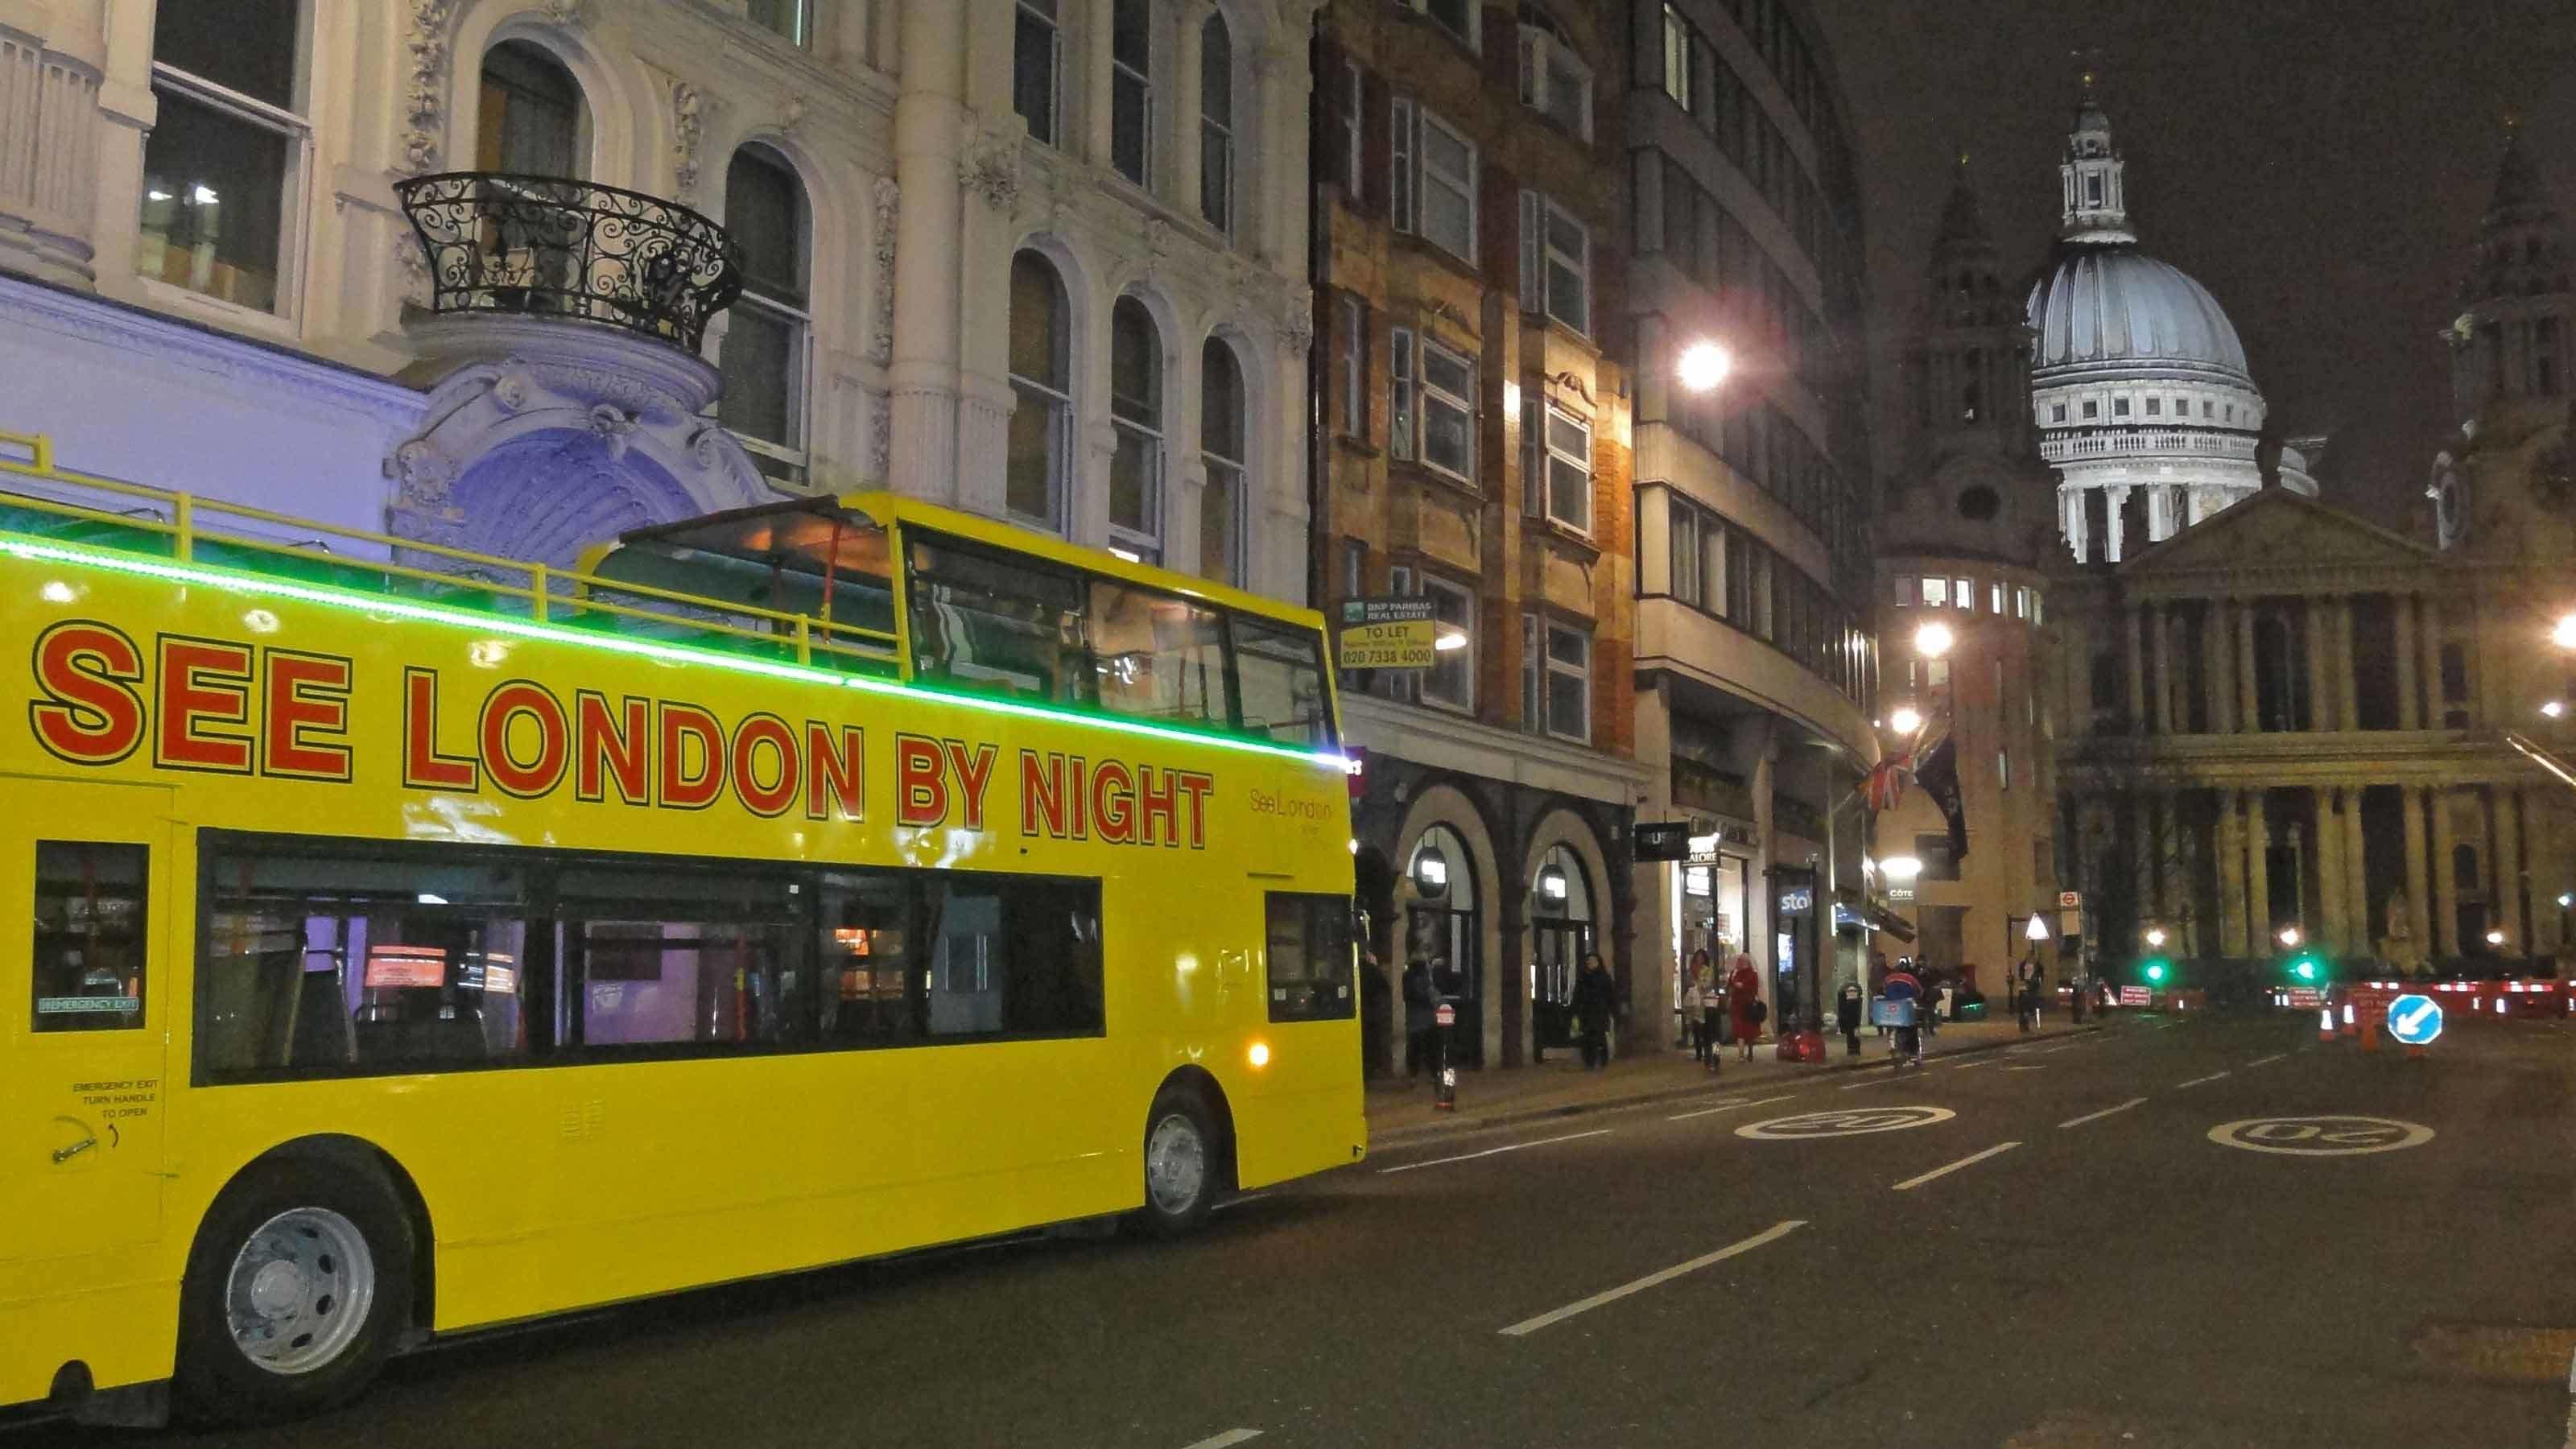 London by night tour bus on street